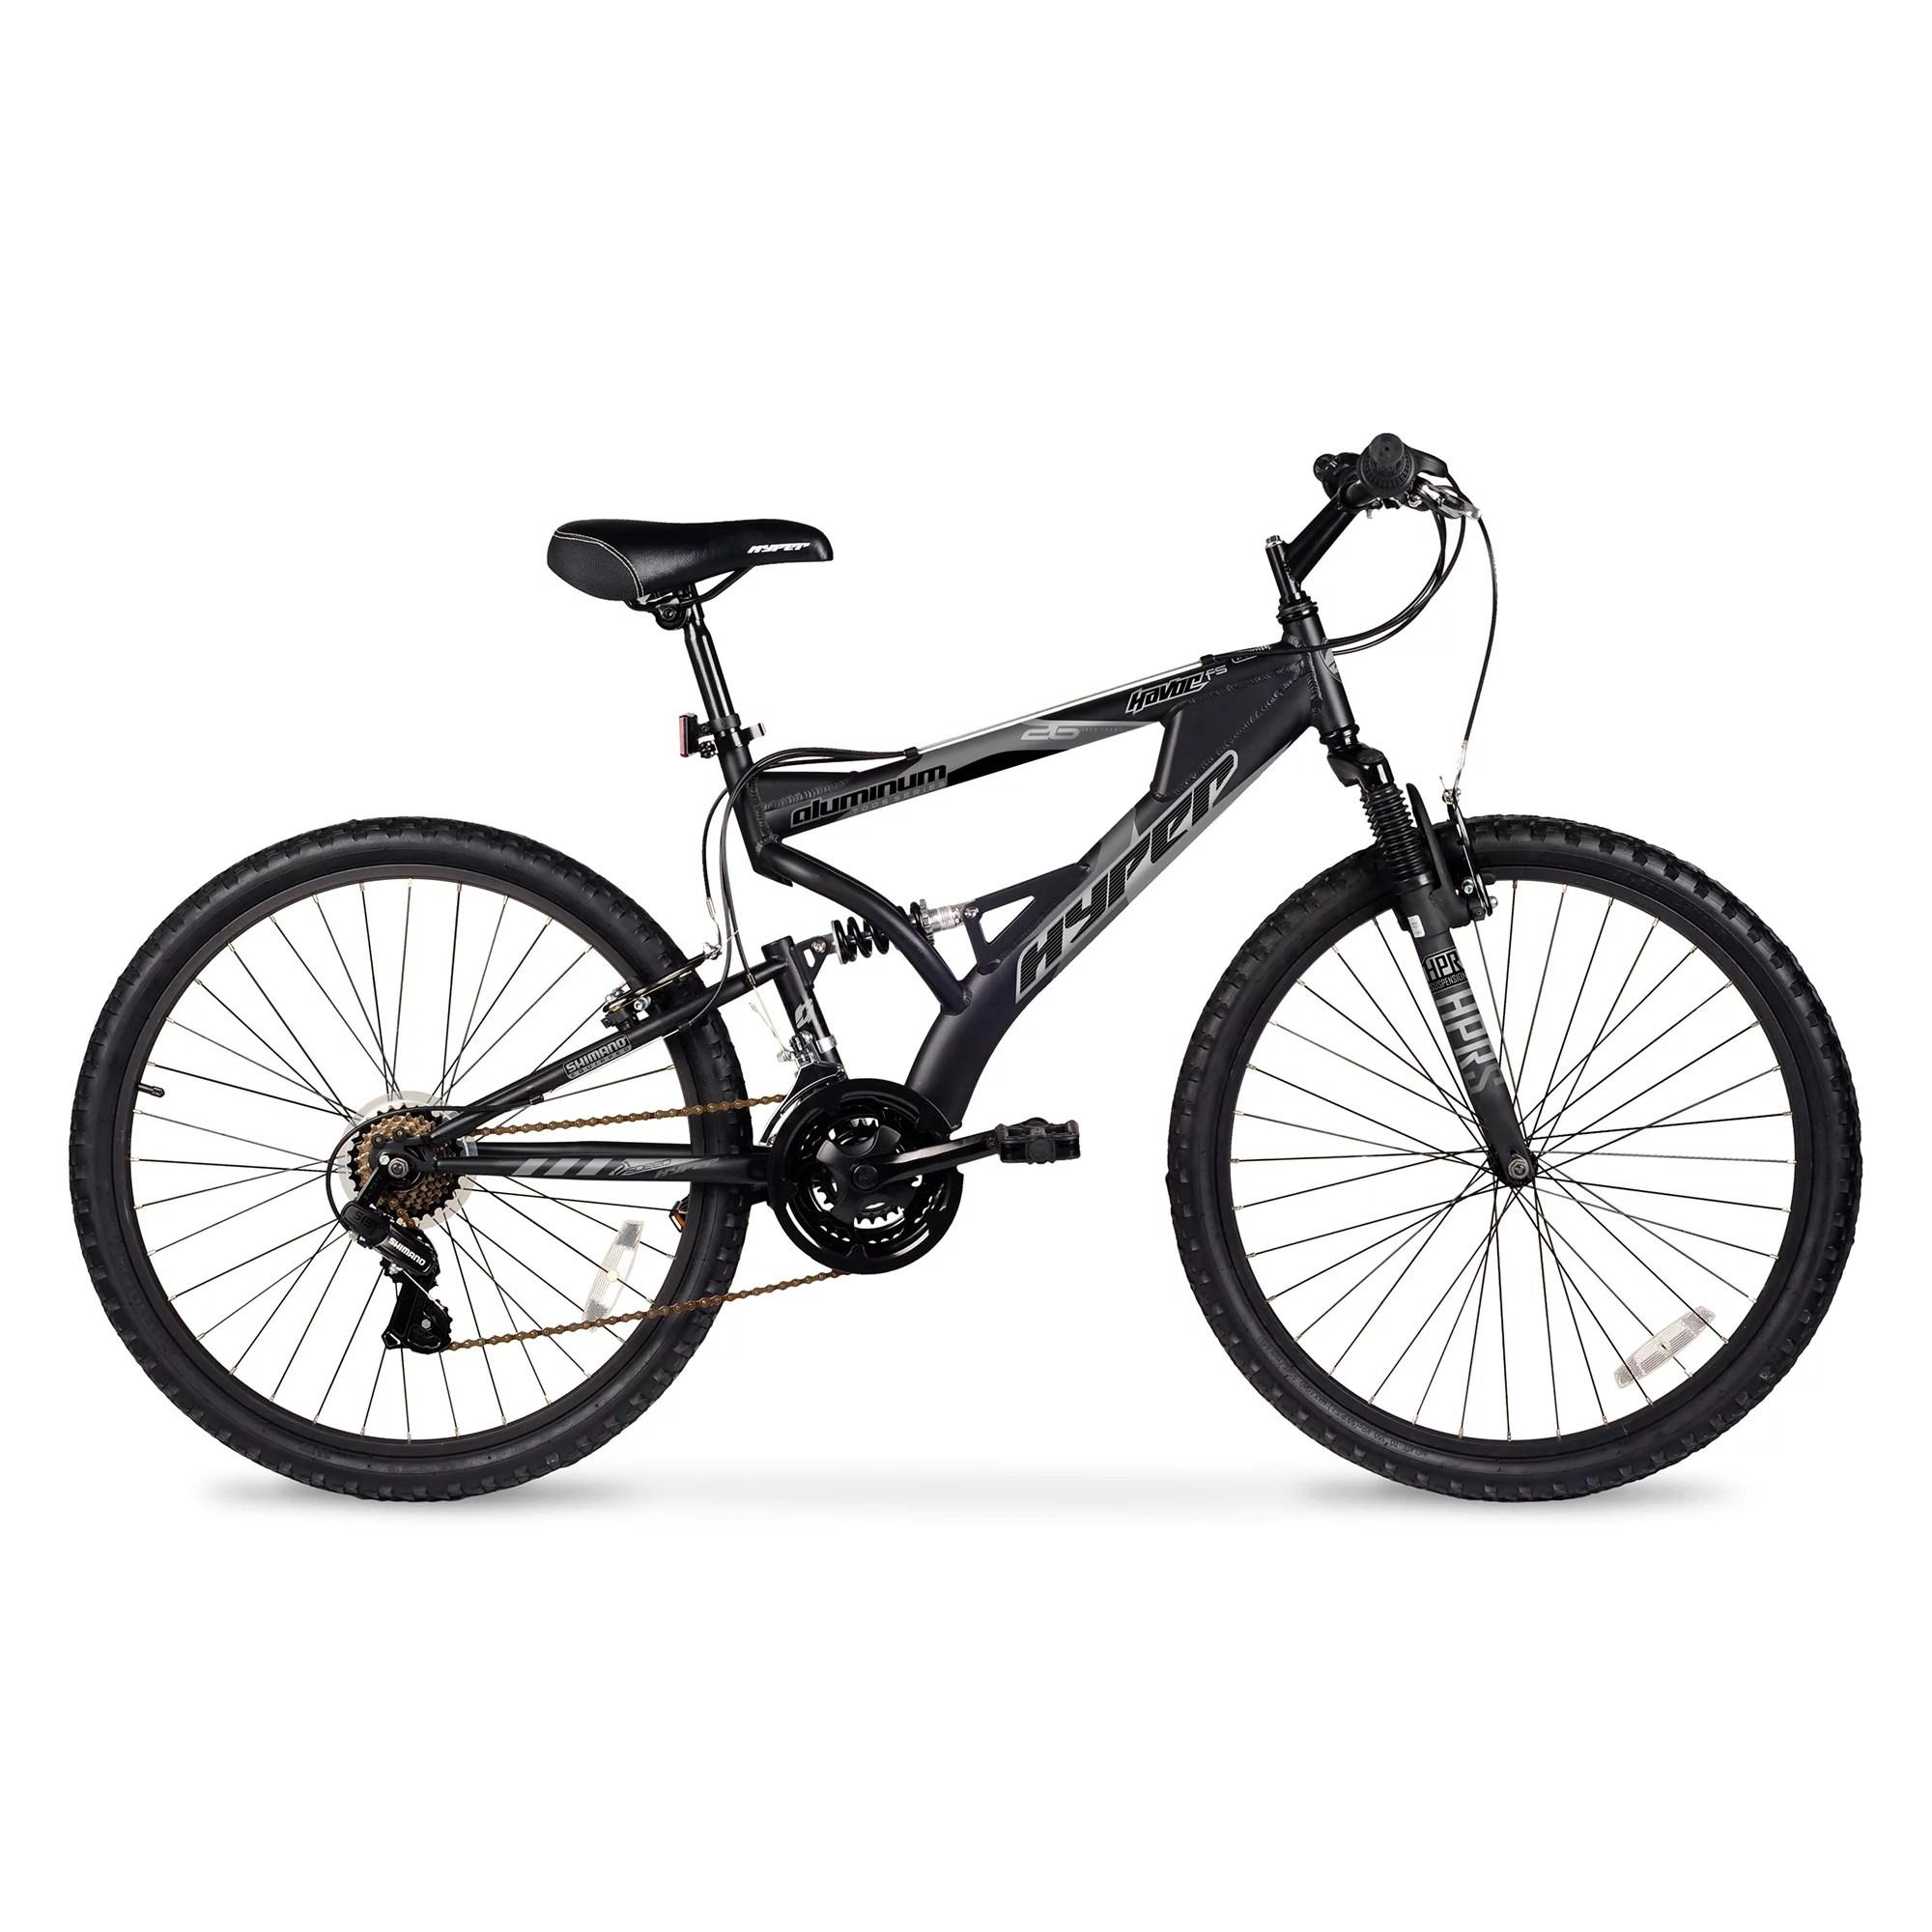 Hyper 26 Havoc Men S Mountain Bike Black